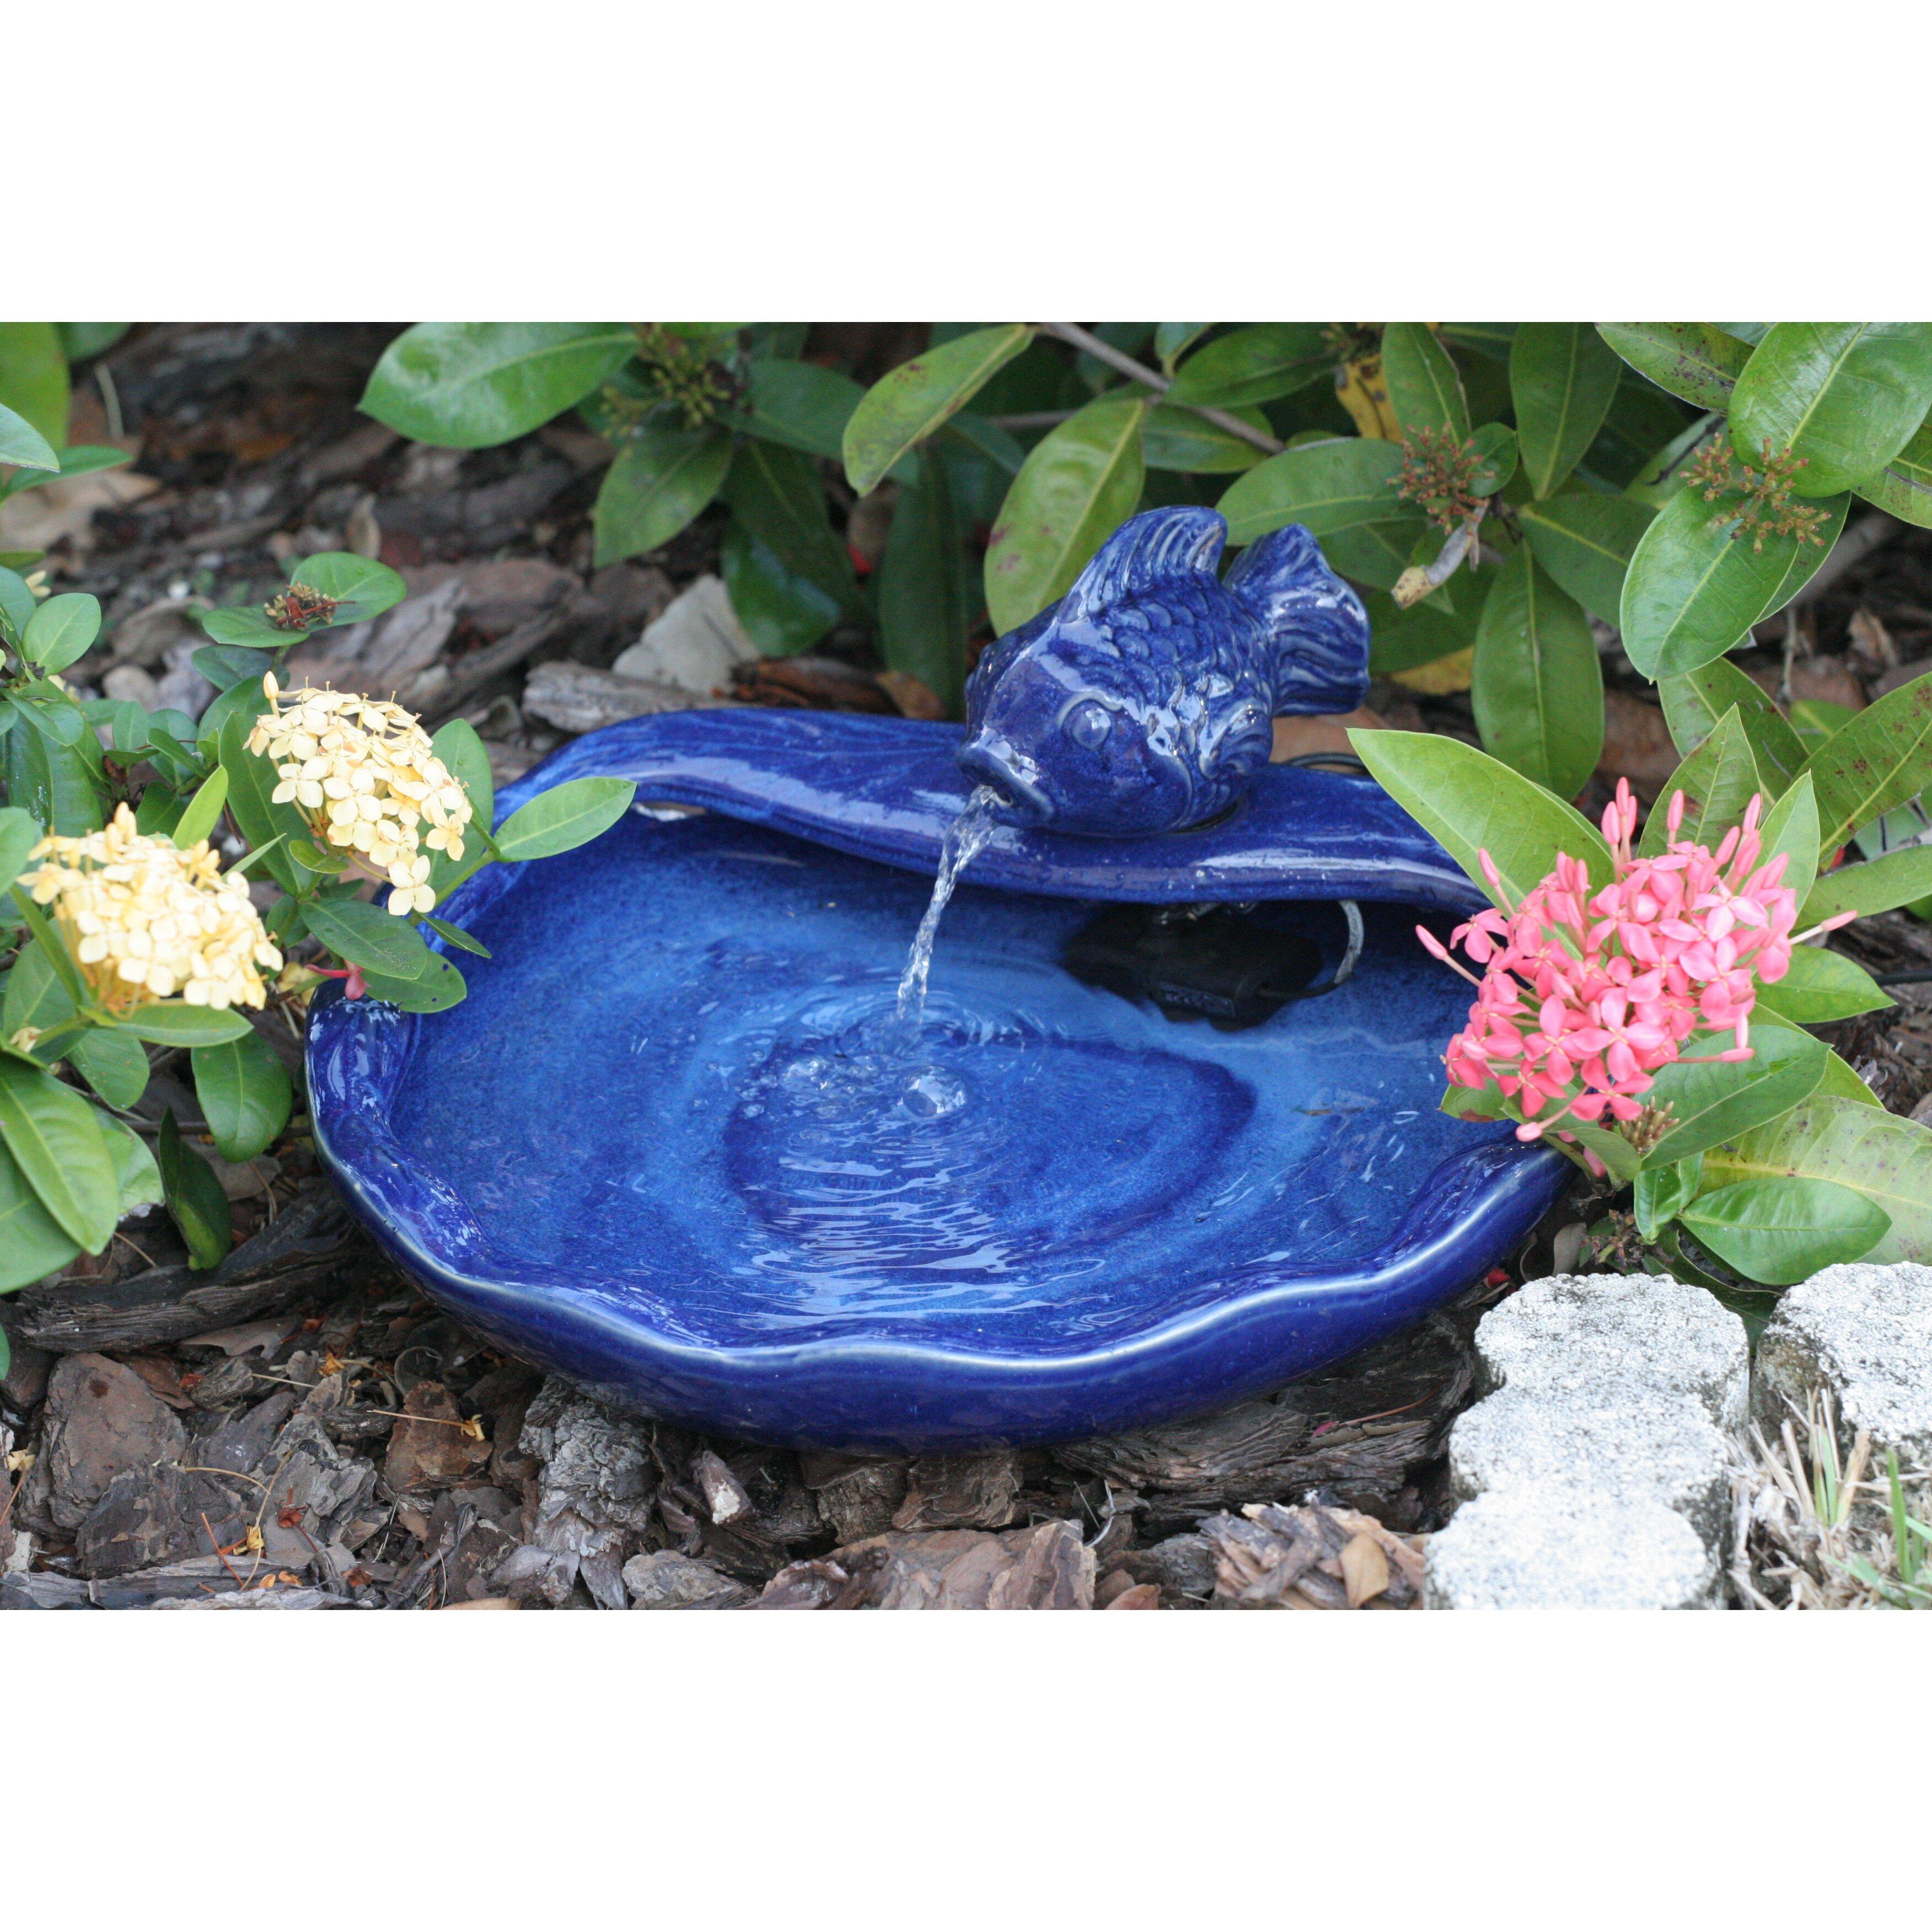 Smart solar solar water features ceramic koi fountain for Koi pond fountains sale